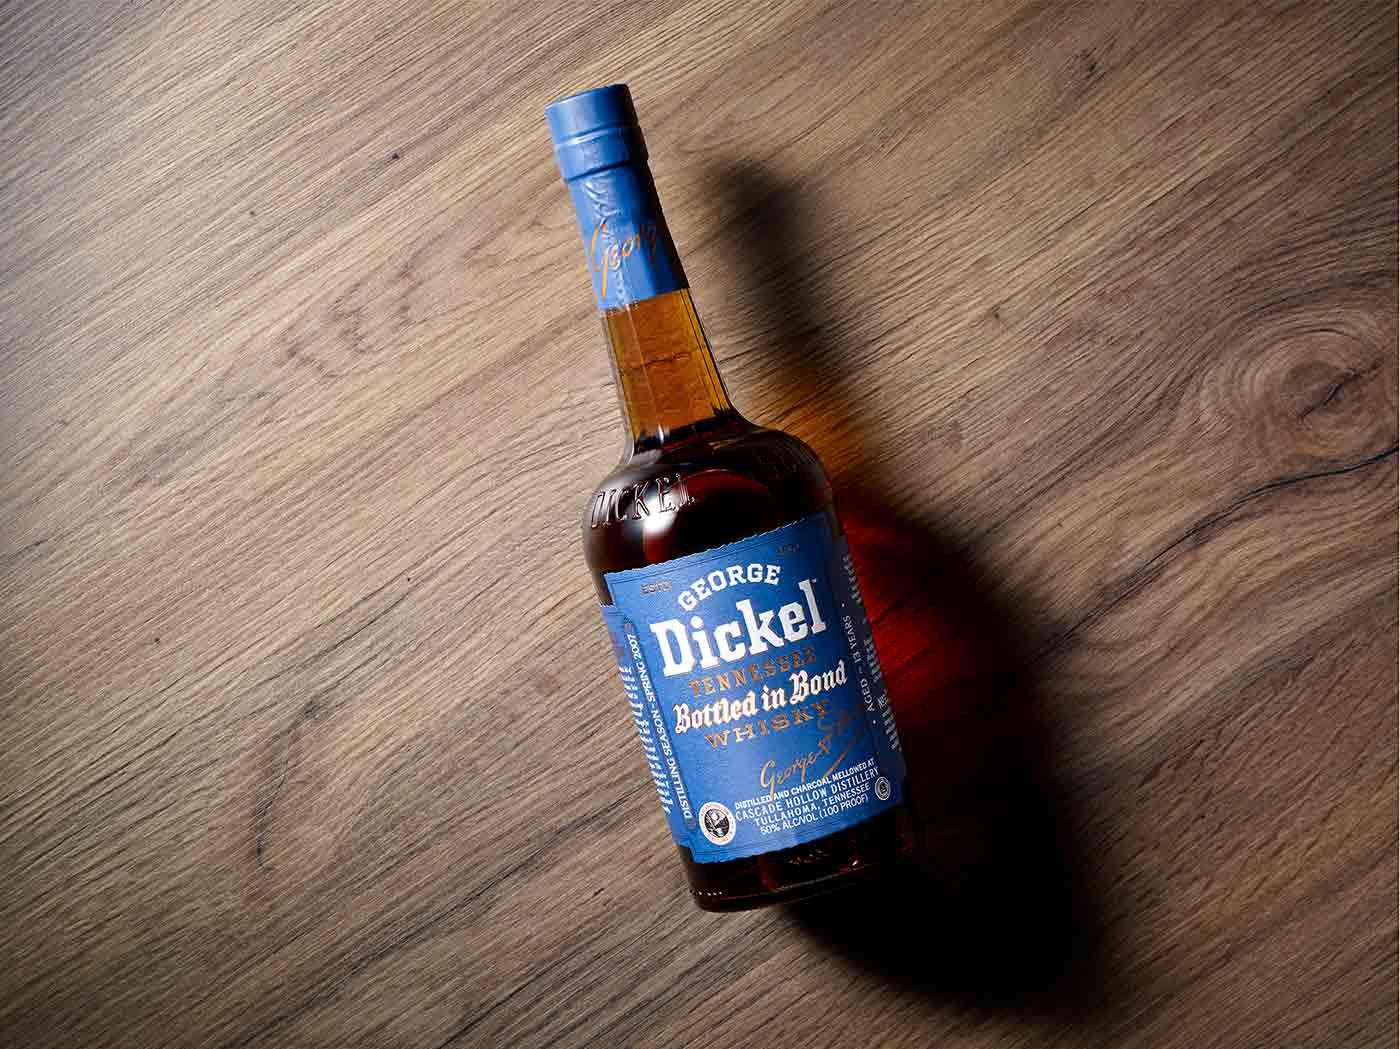 Lagavulin Offerman Edition Guinness: George Dickel Bottled in Bond 13 Year